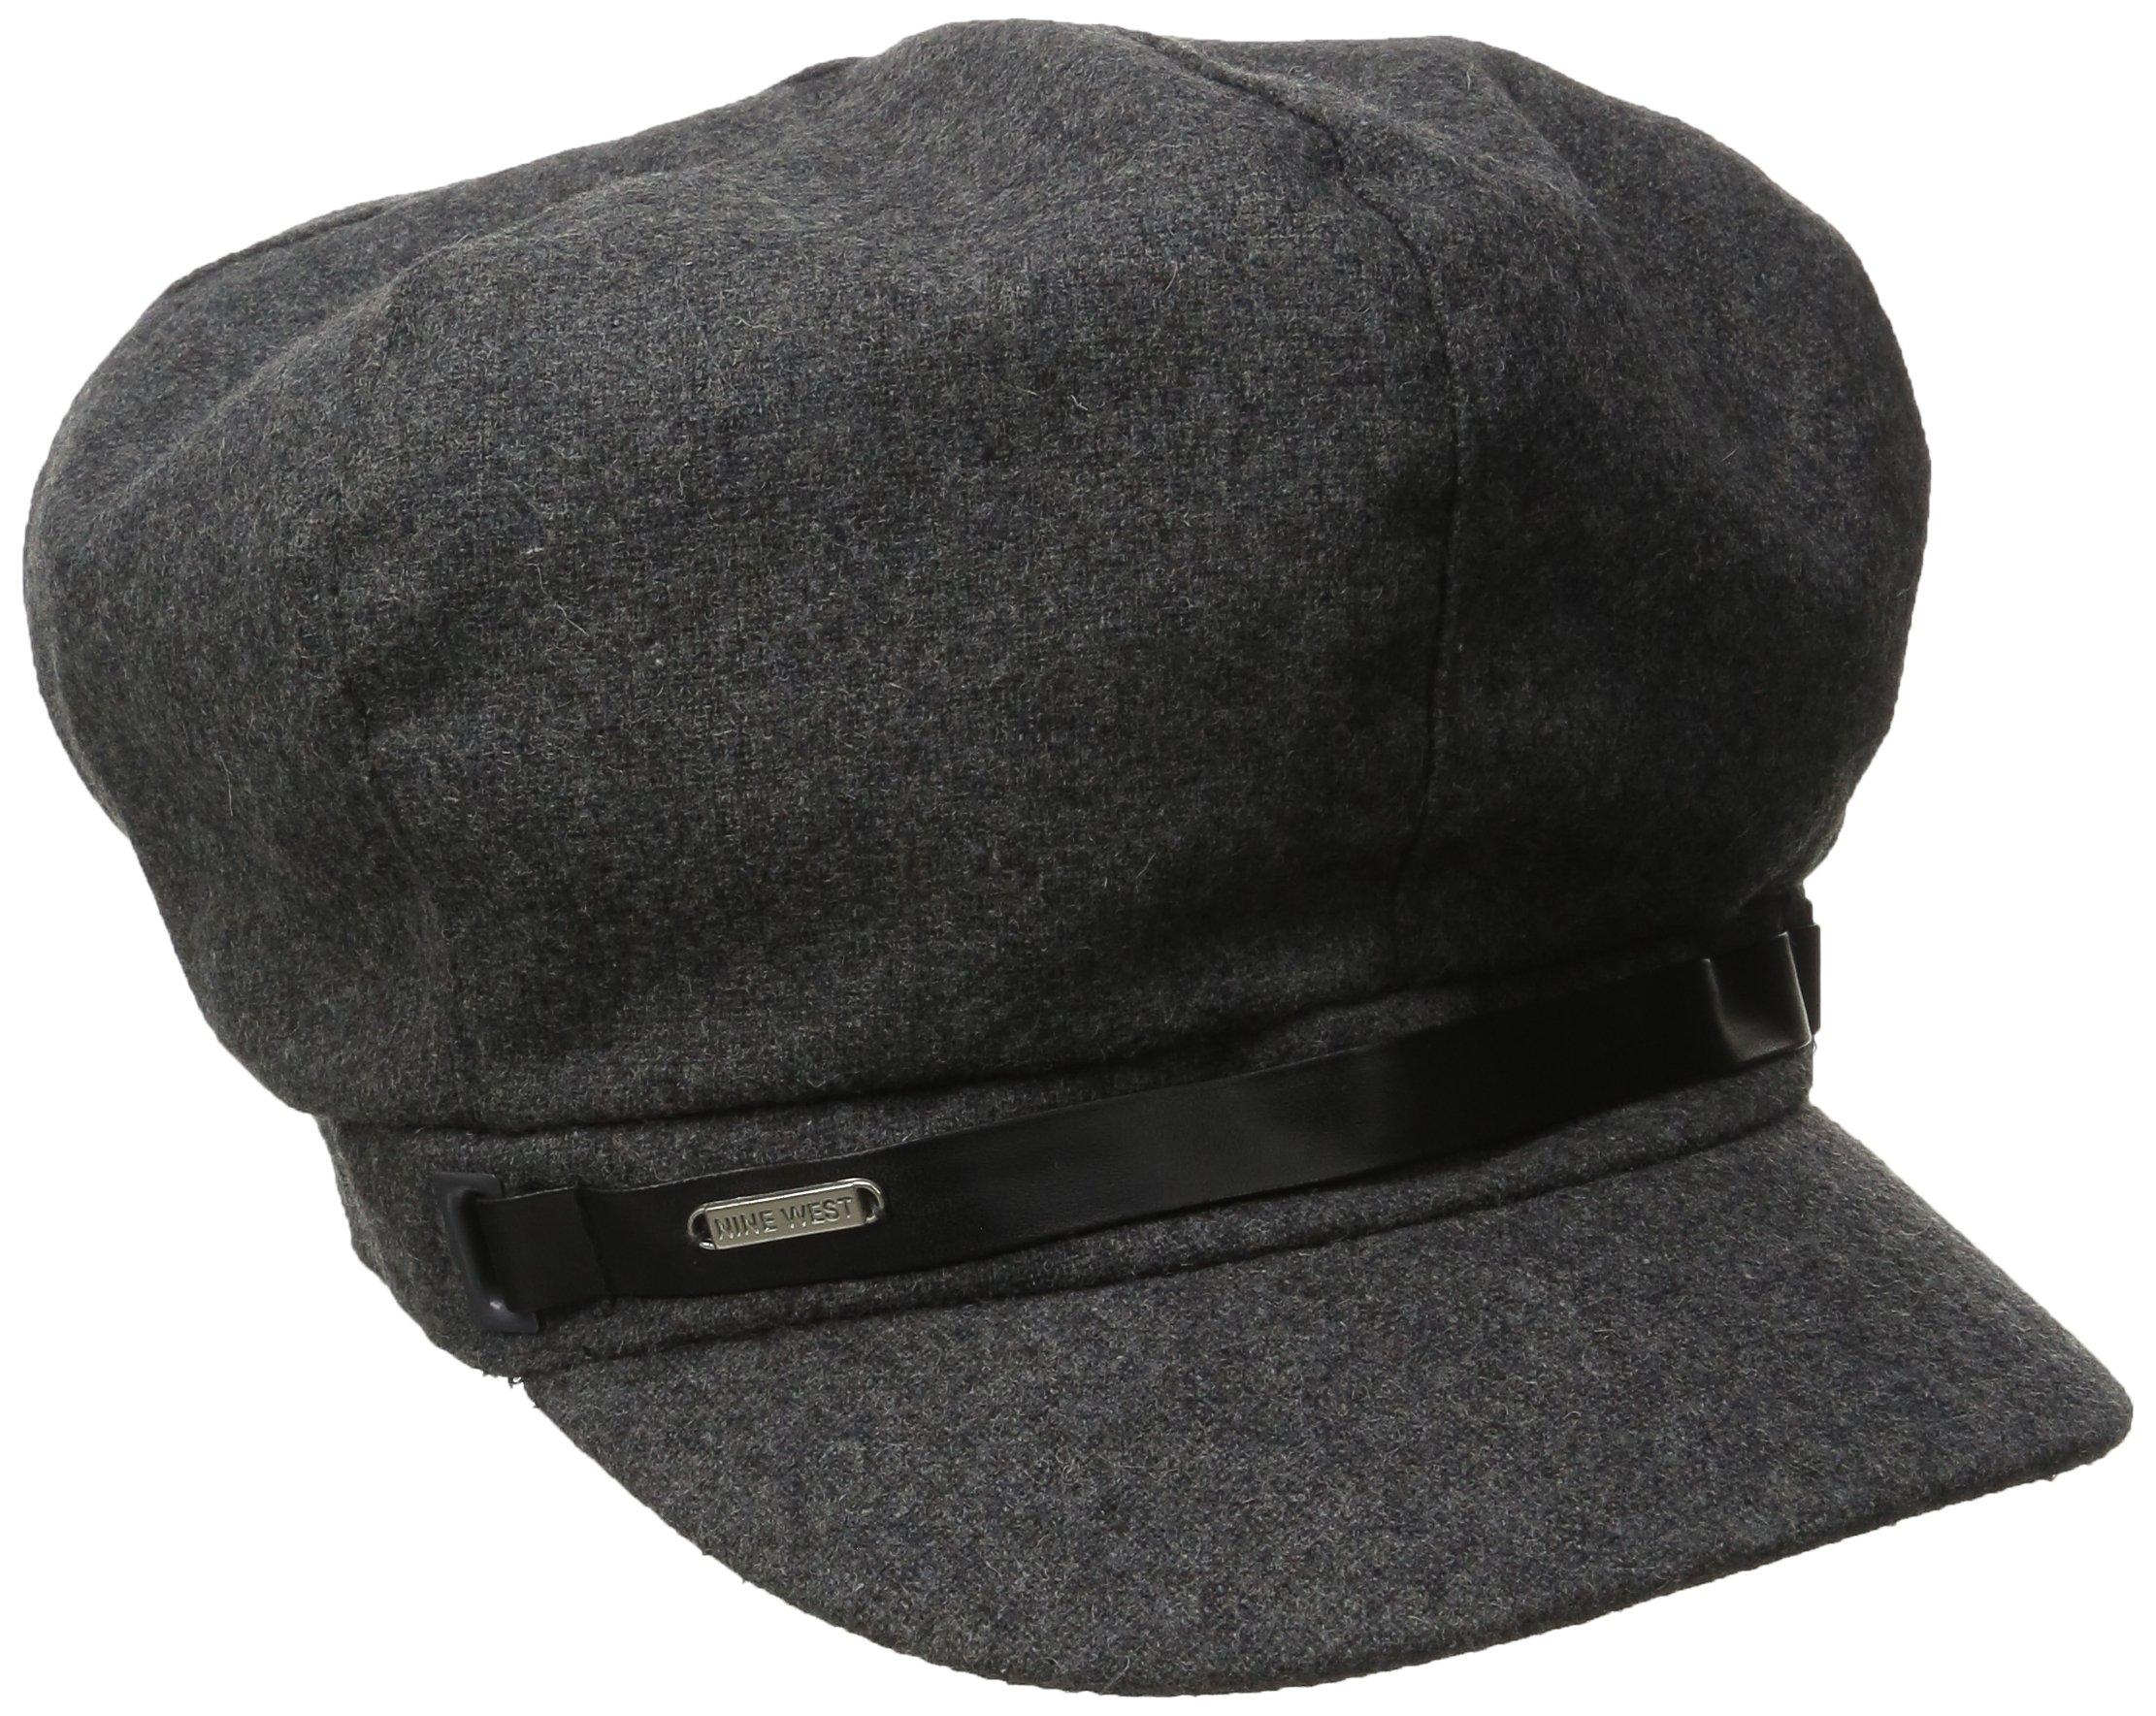 Nine West Women's Wool Blend Newsboy Hat, Charcoal/Grey, One Size